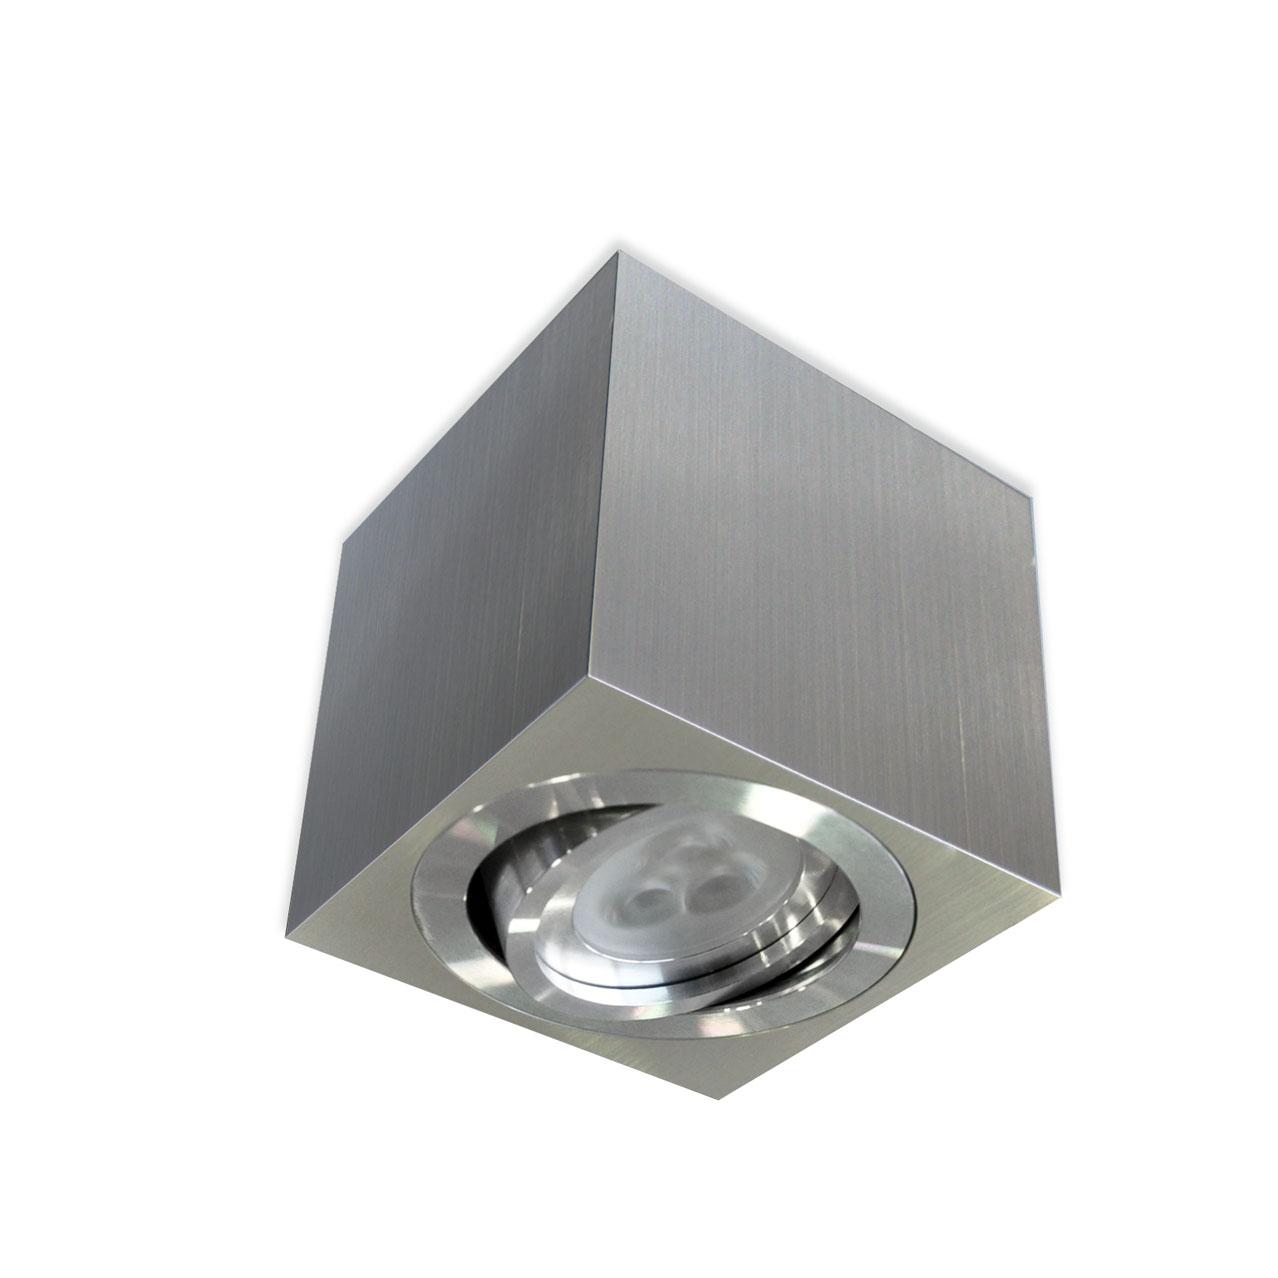 bpm lighting 8016 plaf n cuadrado 1 luz gu10 8016 gu10. Black Bedroom Furniture Sets. Home Design Ideas